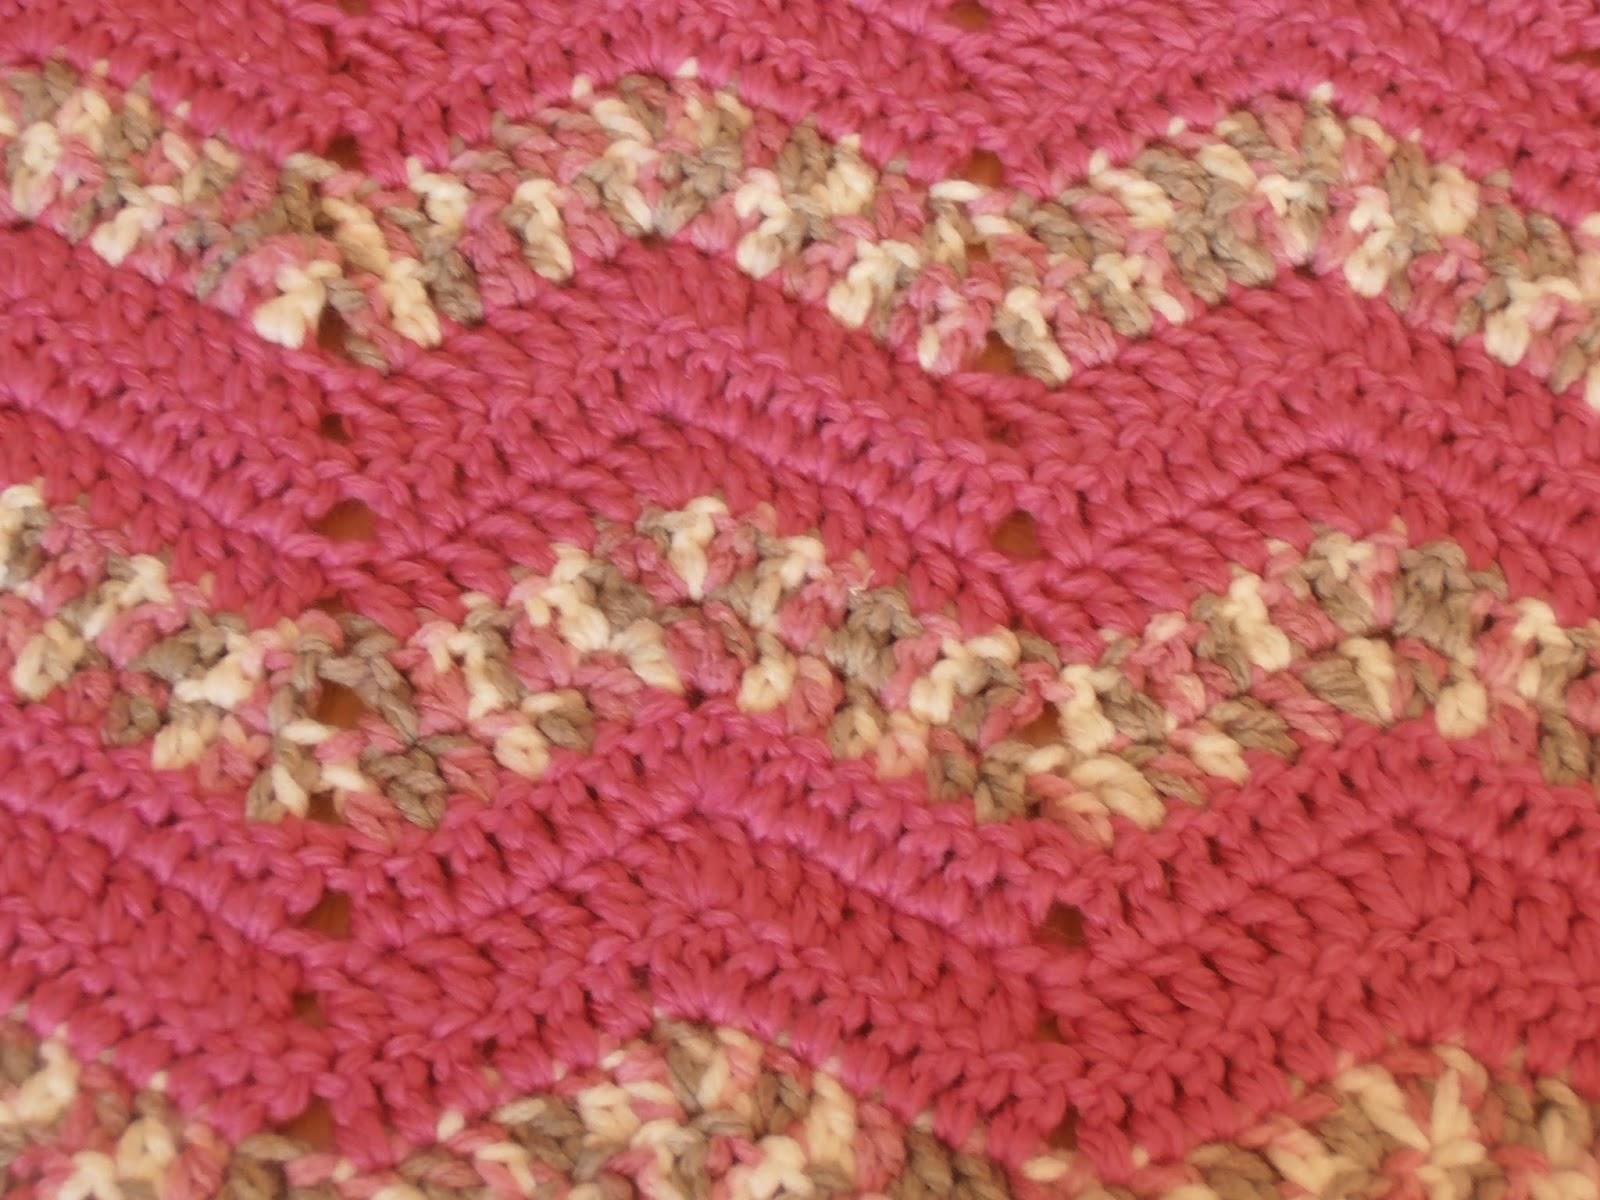 Crochet Patterns Using Variegated Yarn : Crafty Friends: Variegated Crochet Ripple Blanket